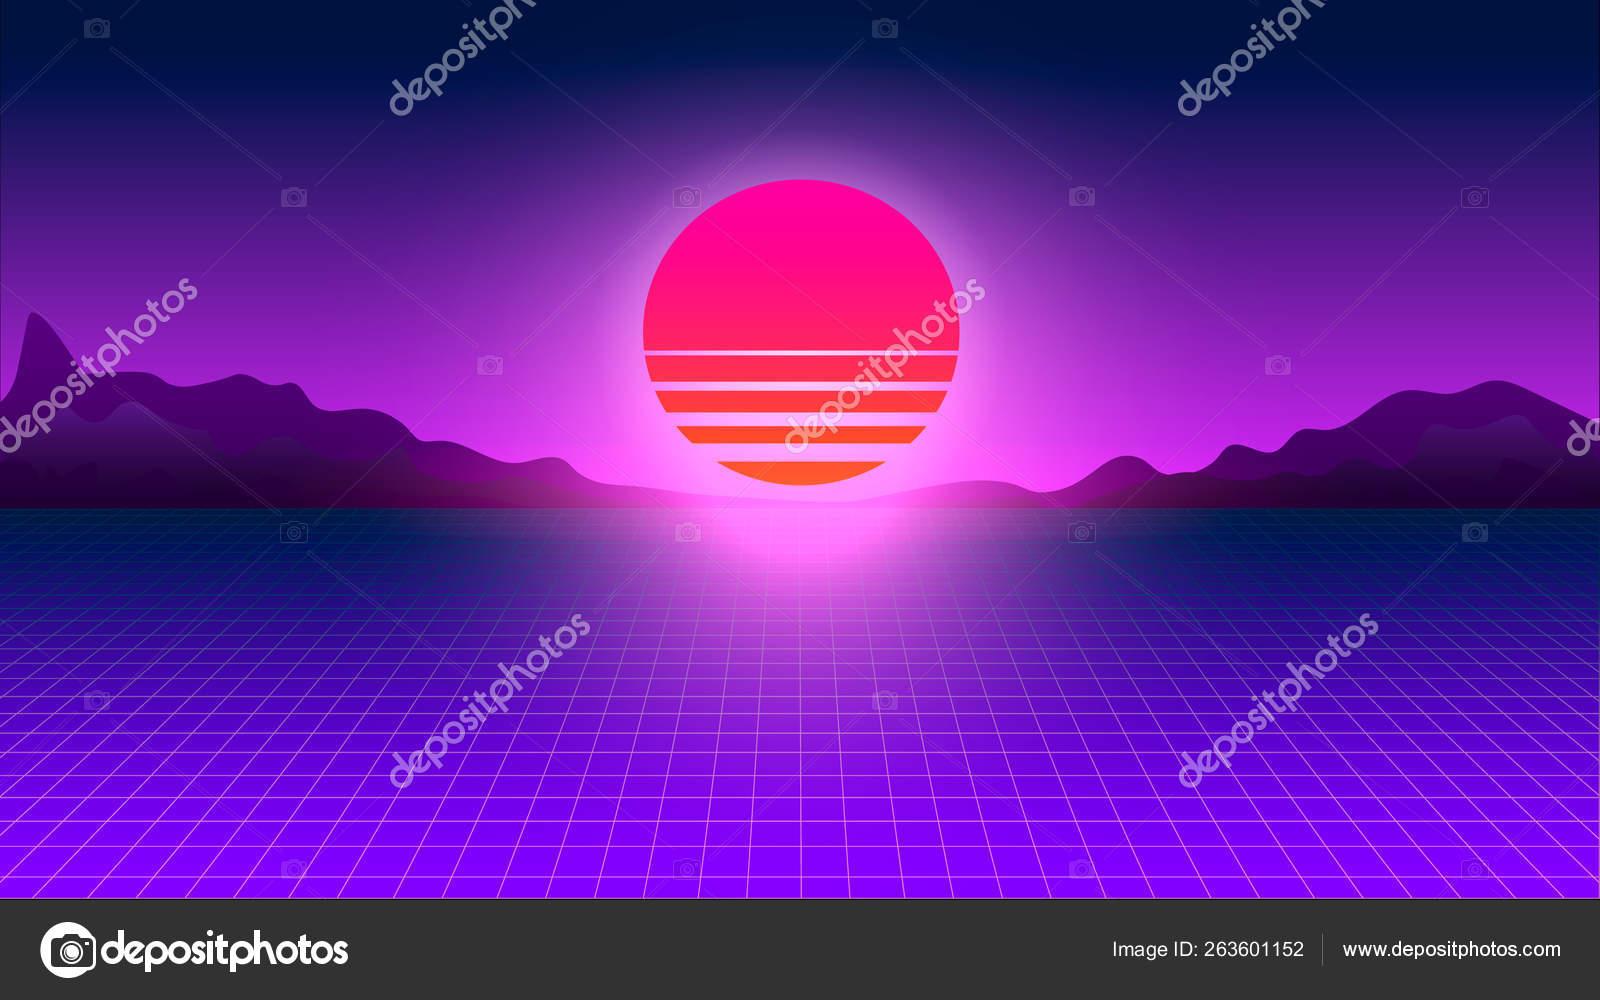 Retrowave Sunset Perspective Grid Futuristic Cyberpunk Neon